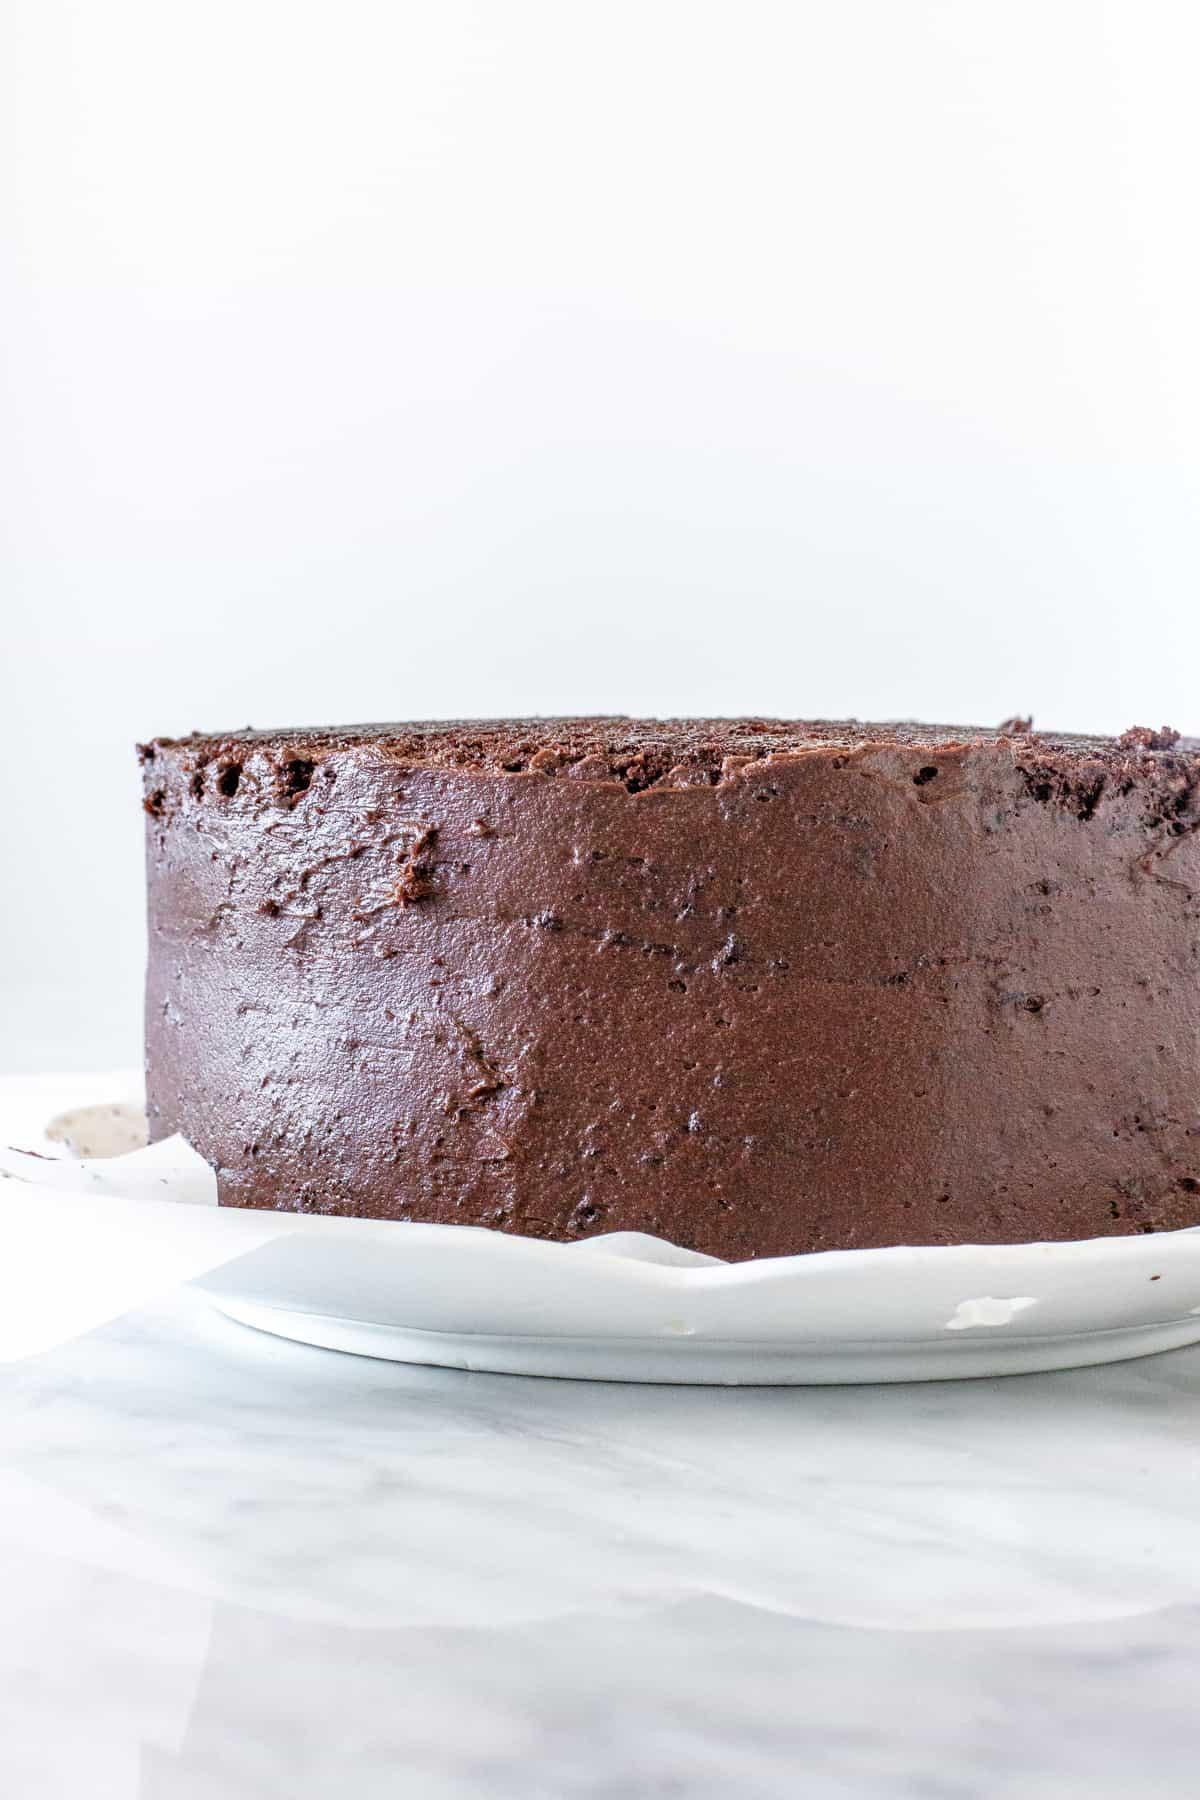 Chocolate cake with crumb coat around the sides.